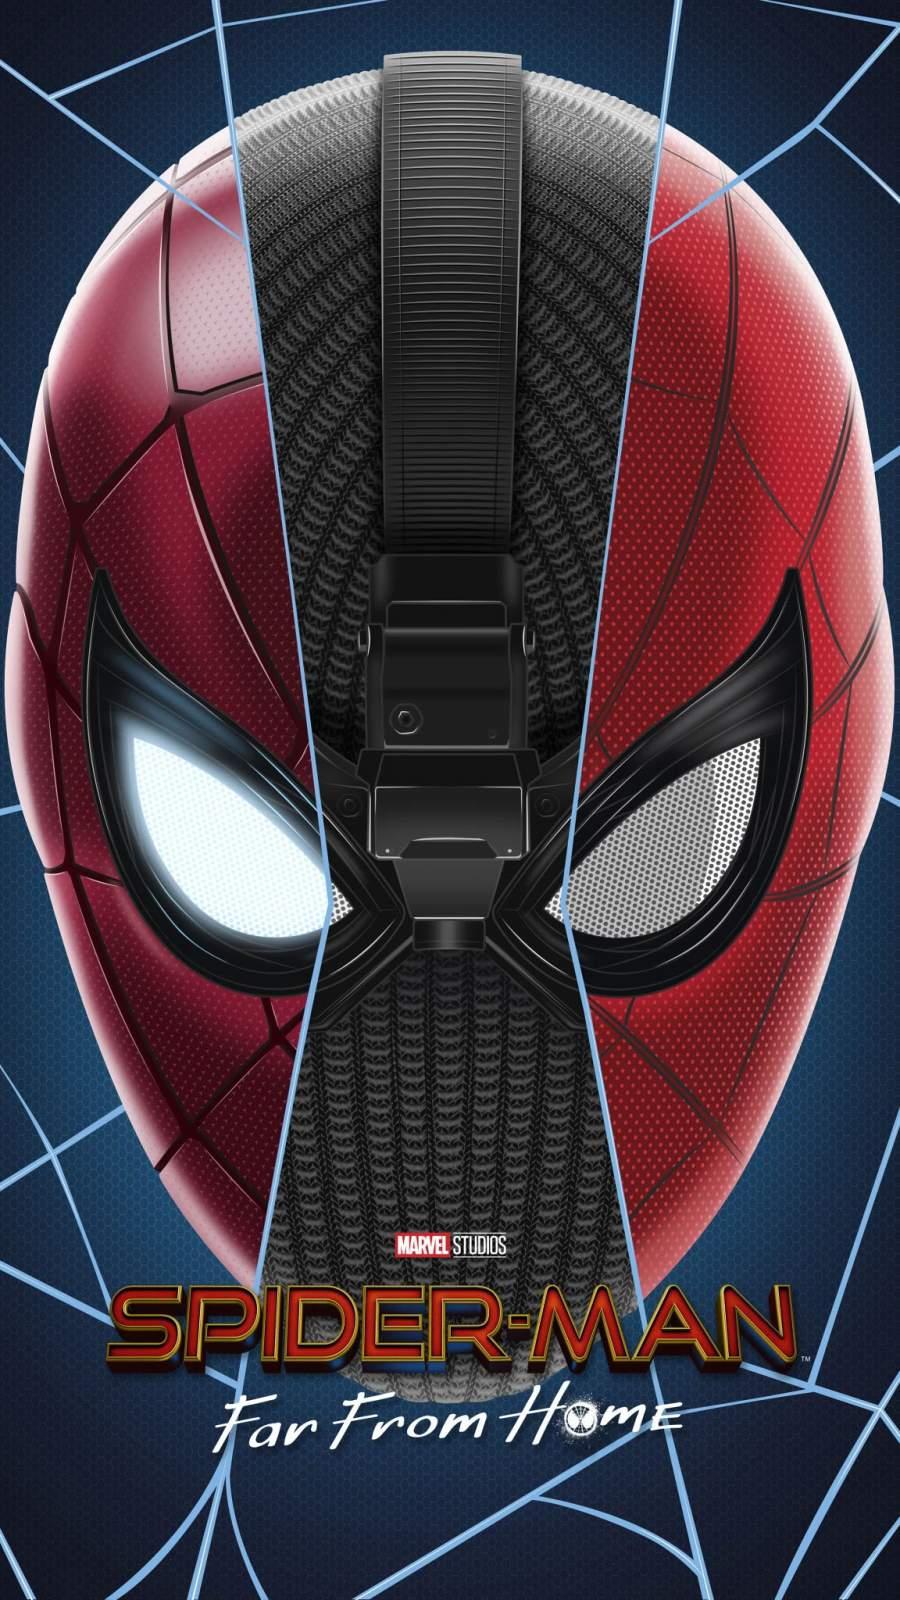 Spiderman Stealth iPhone Wallpaper